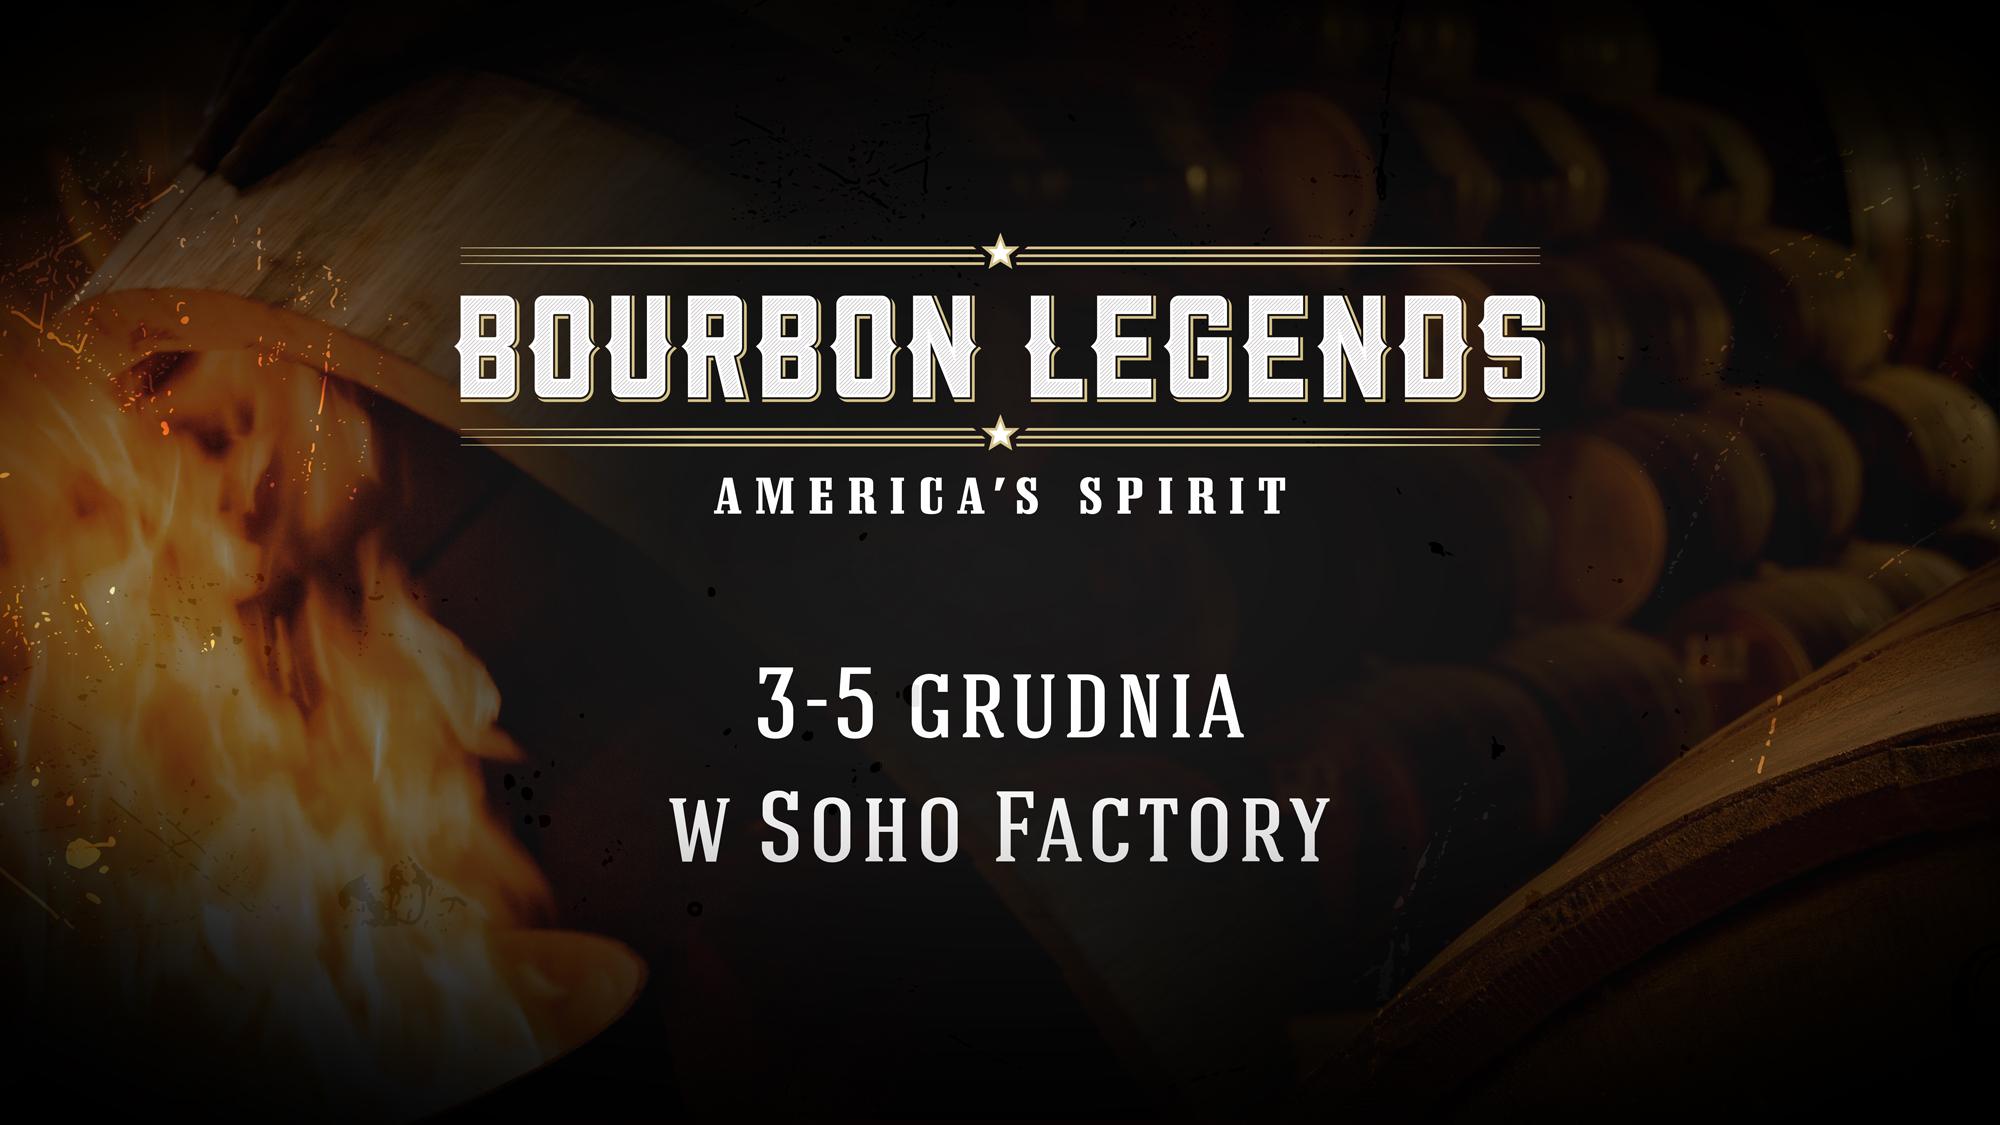 Bourbon-Legends_beczki3_16x9